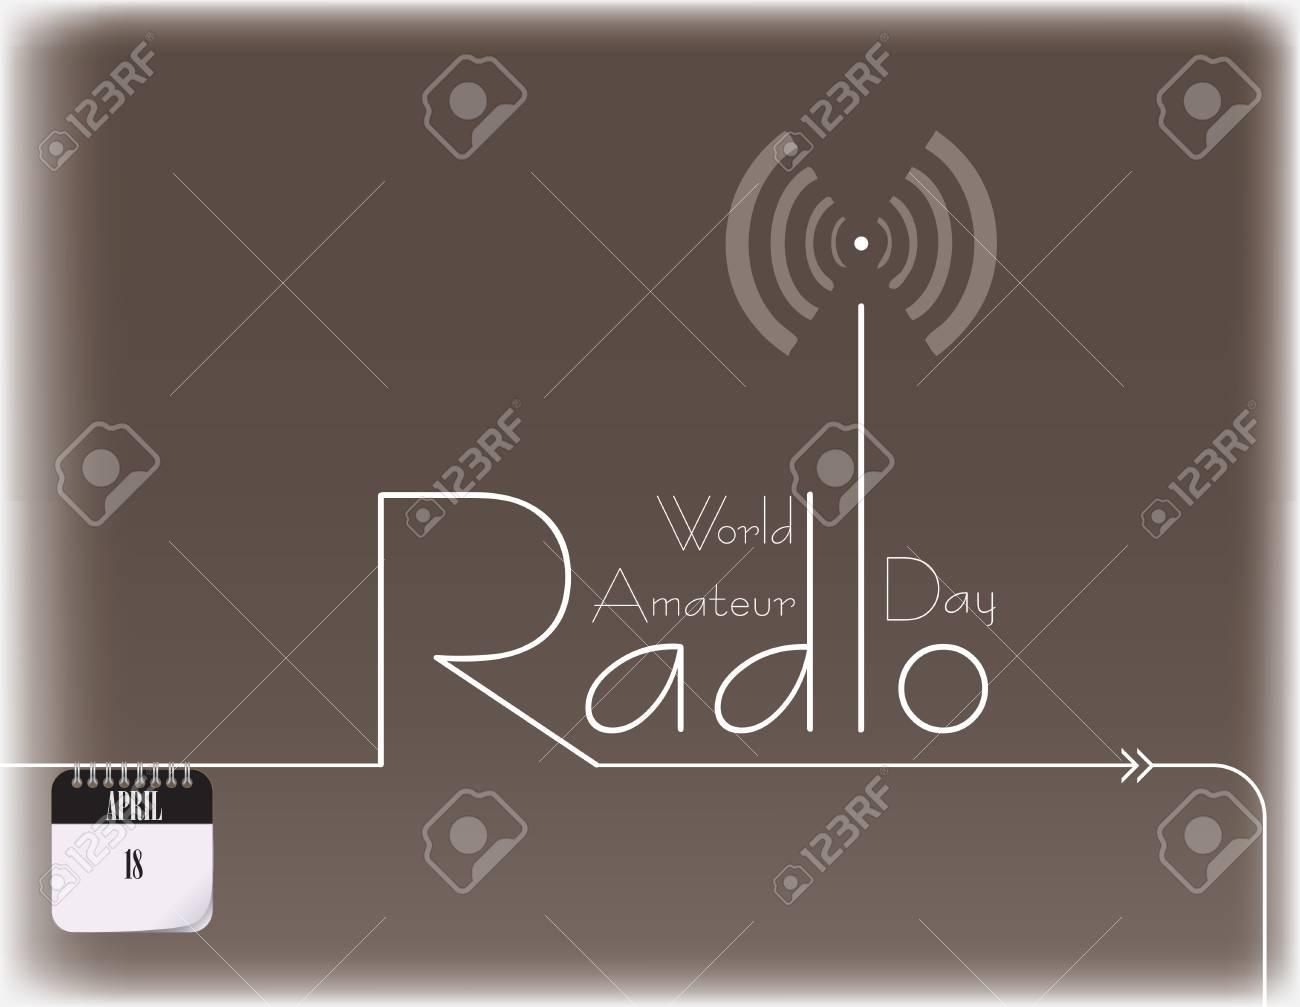 Poster for World Amateur Radio Day - april 18 Vector illustration. - 97622343